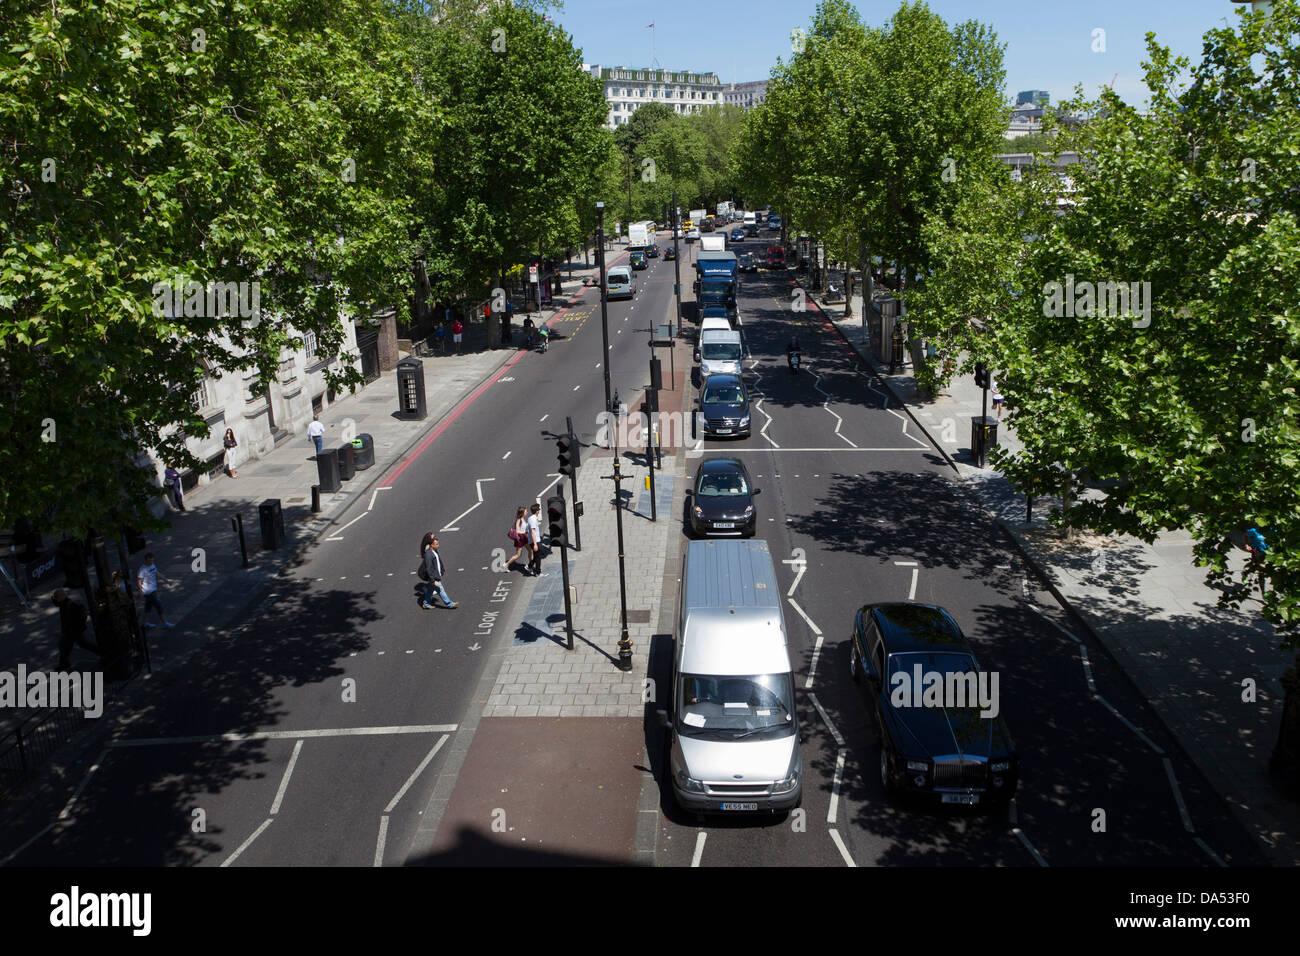 Traffic on Victoria Embankment, London, England, UK - Stock Image